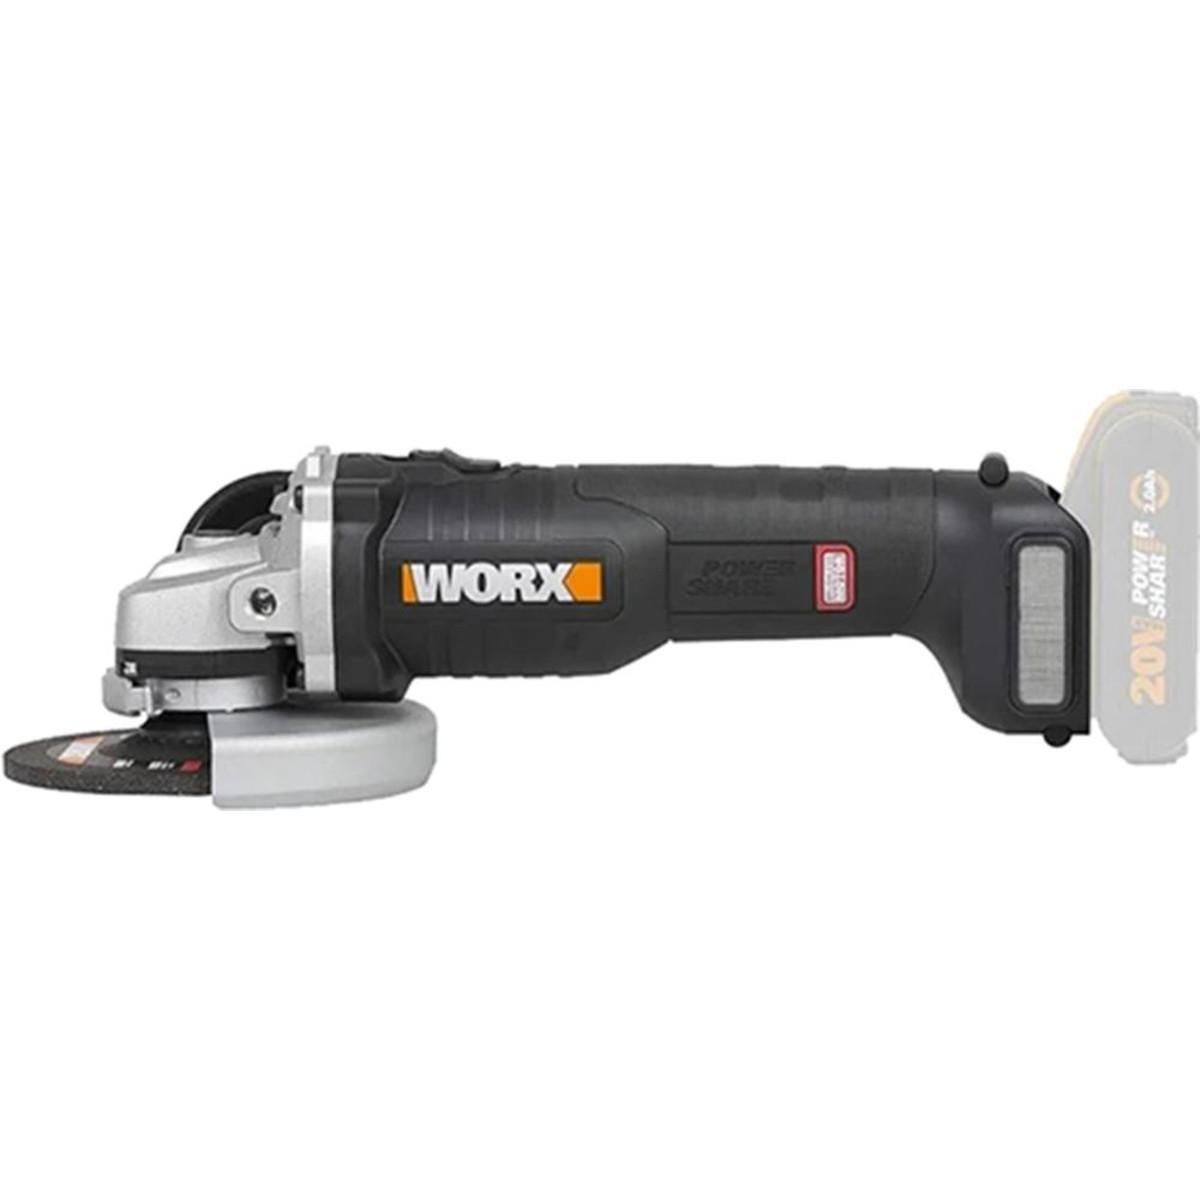 Аккумуляторная угловая шлифовальная машина Worx WX812.9